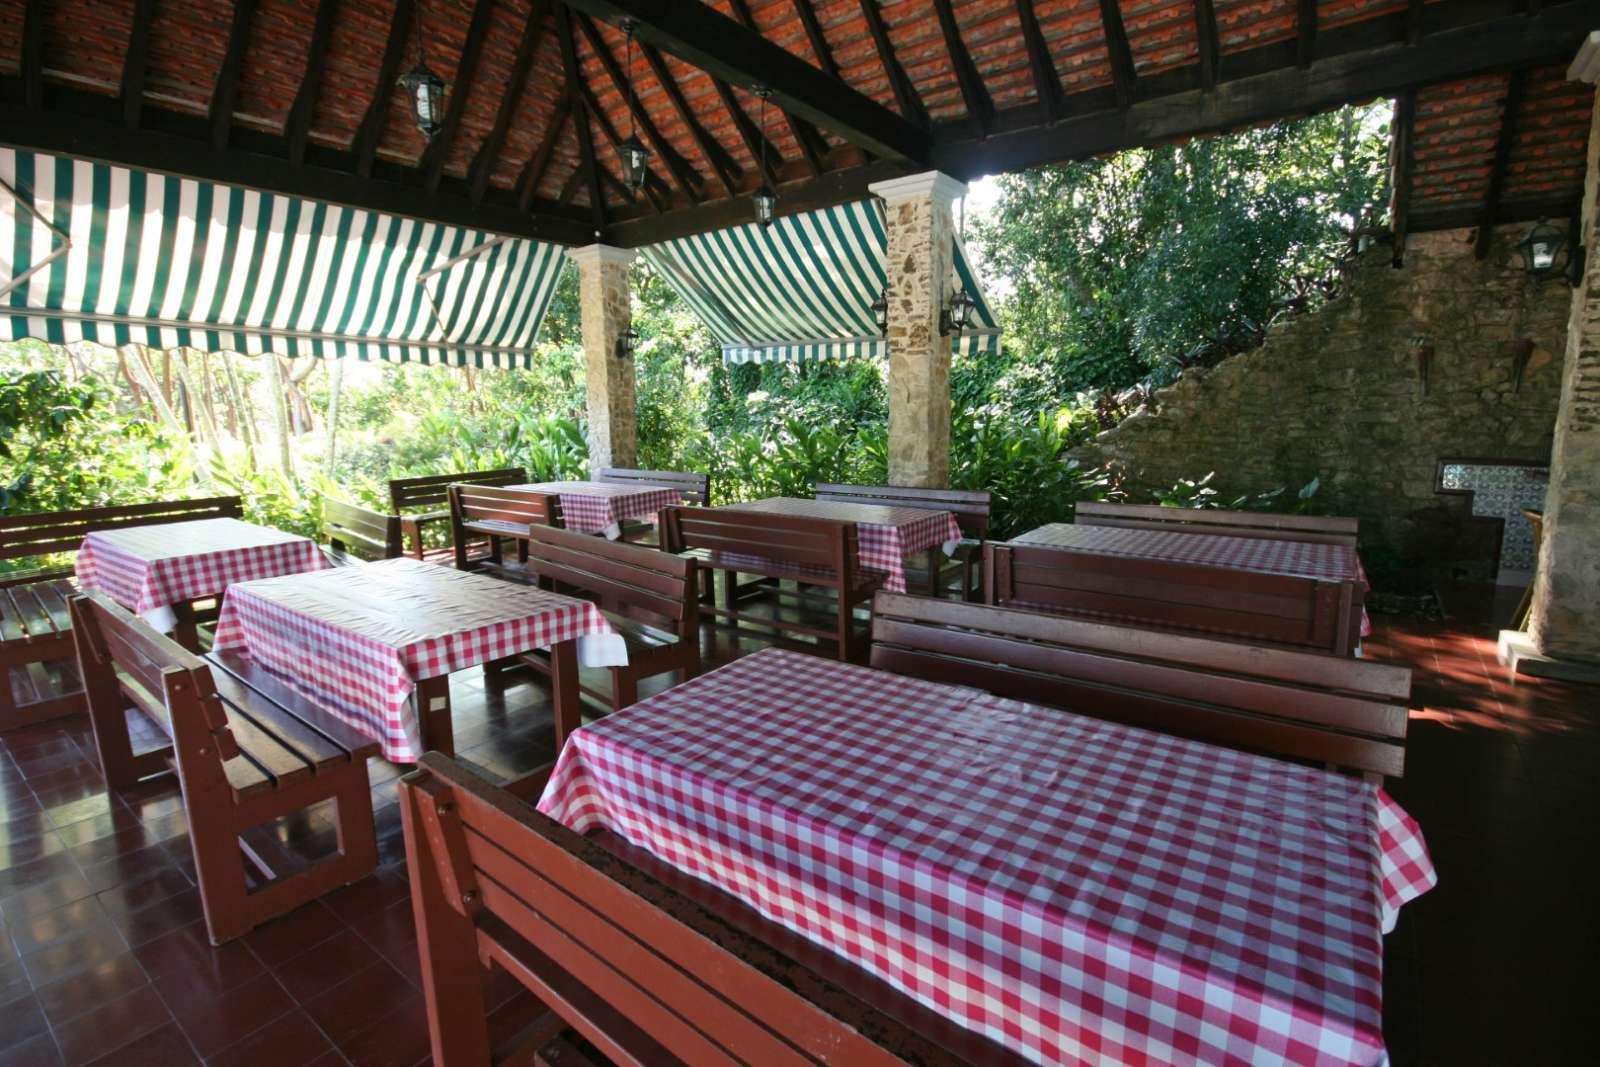 Pool bar and restaurant at La Moka hotel in Las Terrazas, Cuba